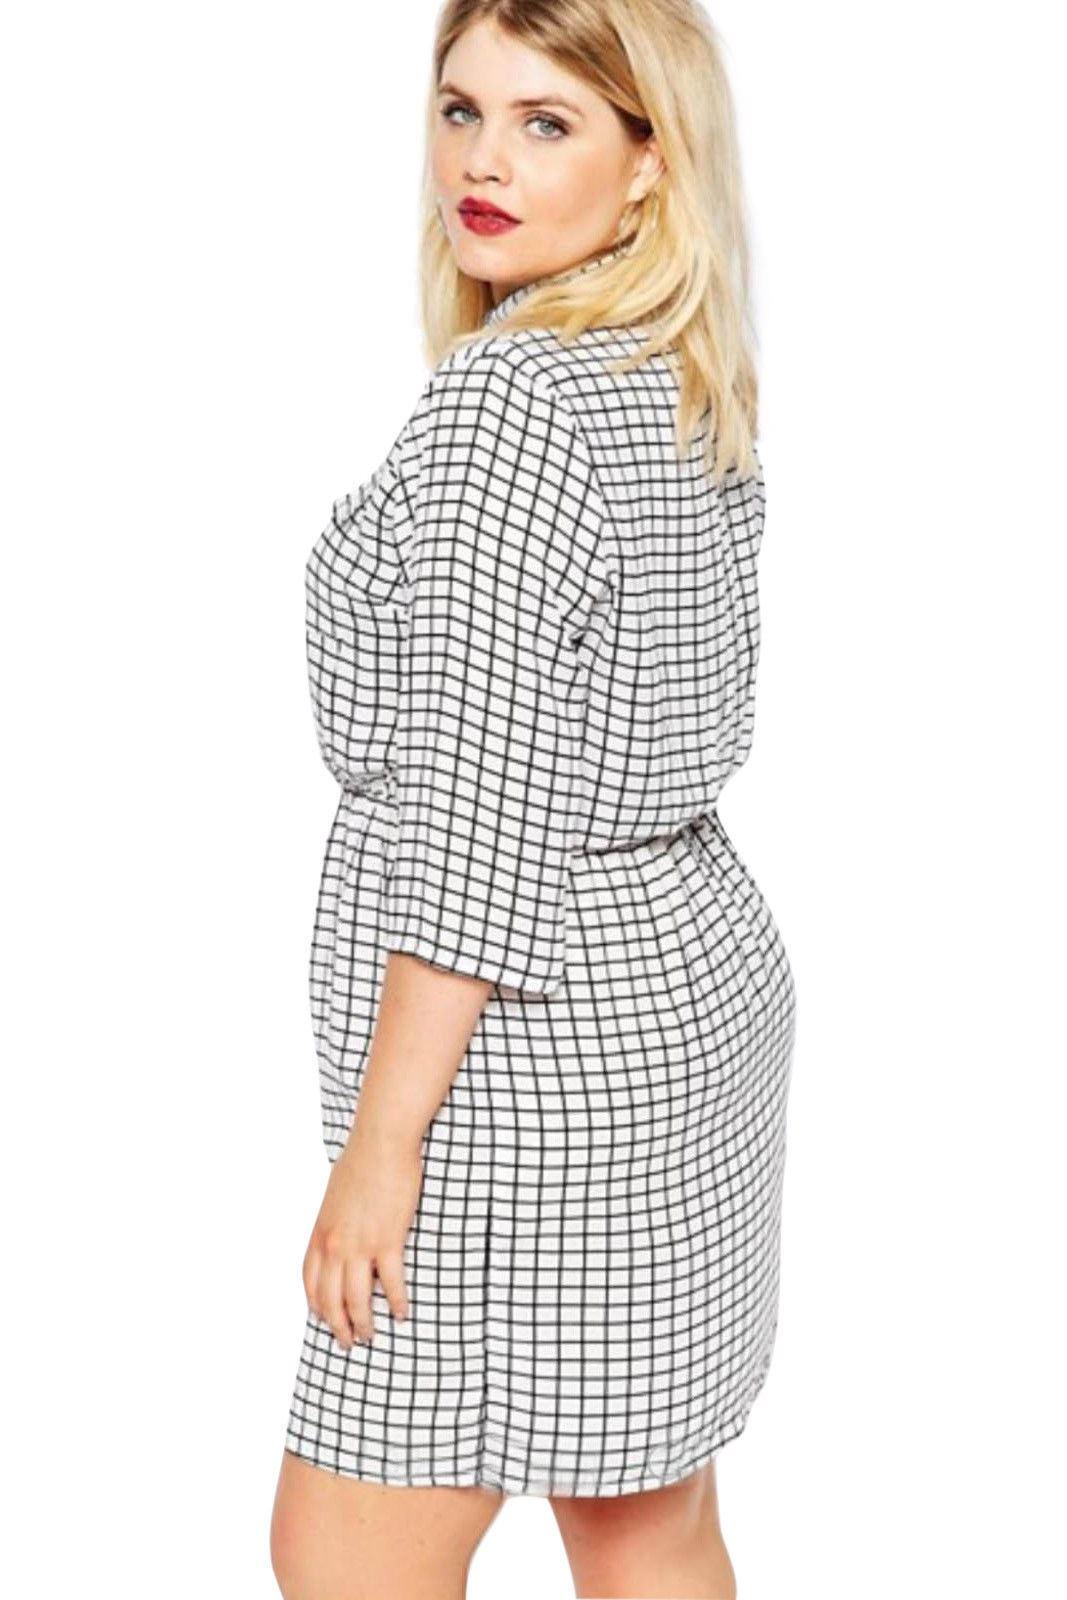 378d22032e48 BOOHOO Ivory Black Check Dress or Long Shirt Top | SALE | Was £22 | eBay